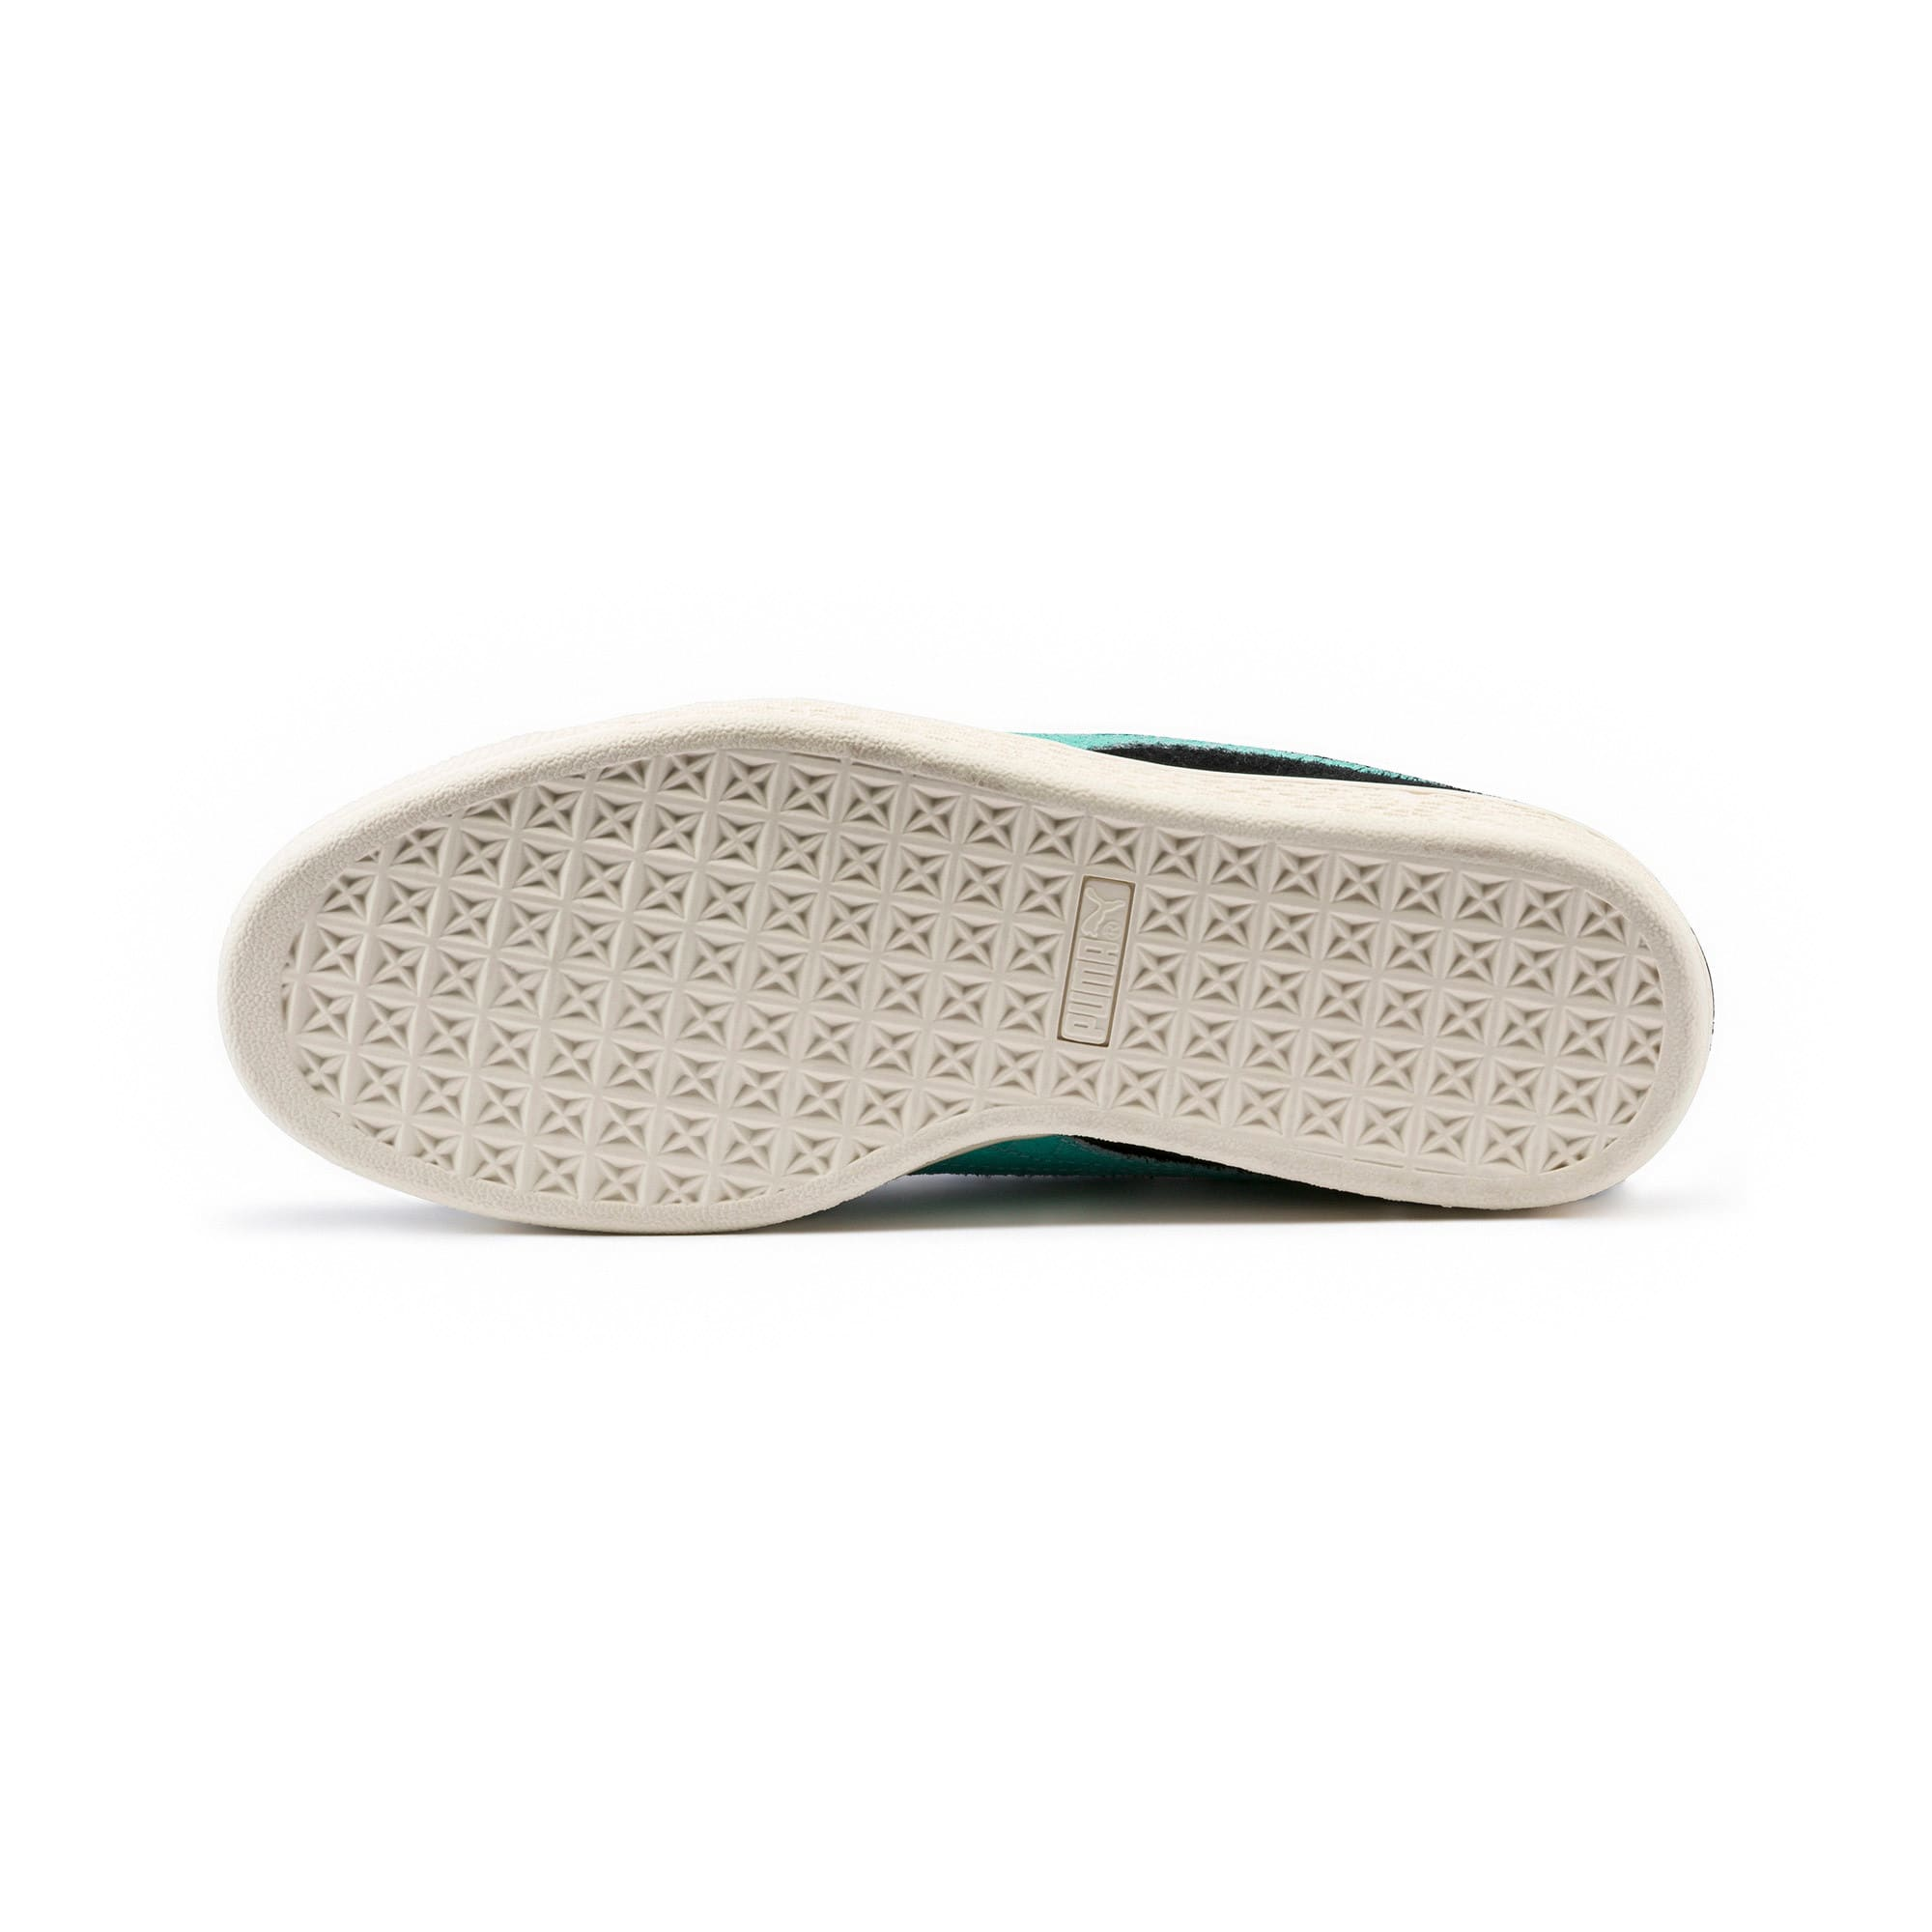 Thumbnail 3 of PUMA x DIAMOND Suede Sneakers, Puma Black-Diamond Blue, medium